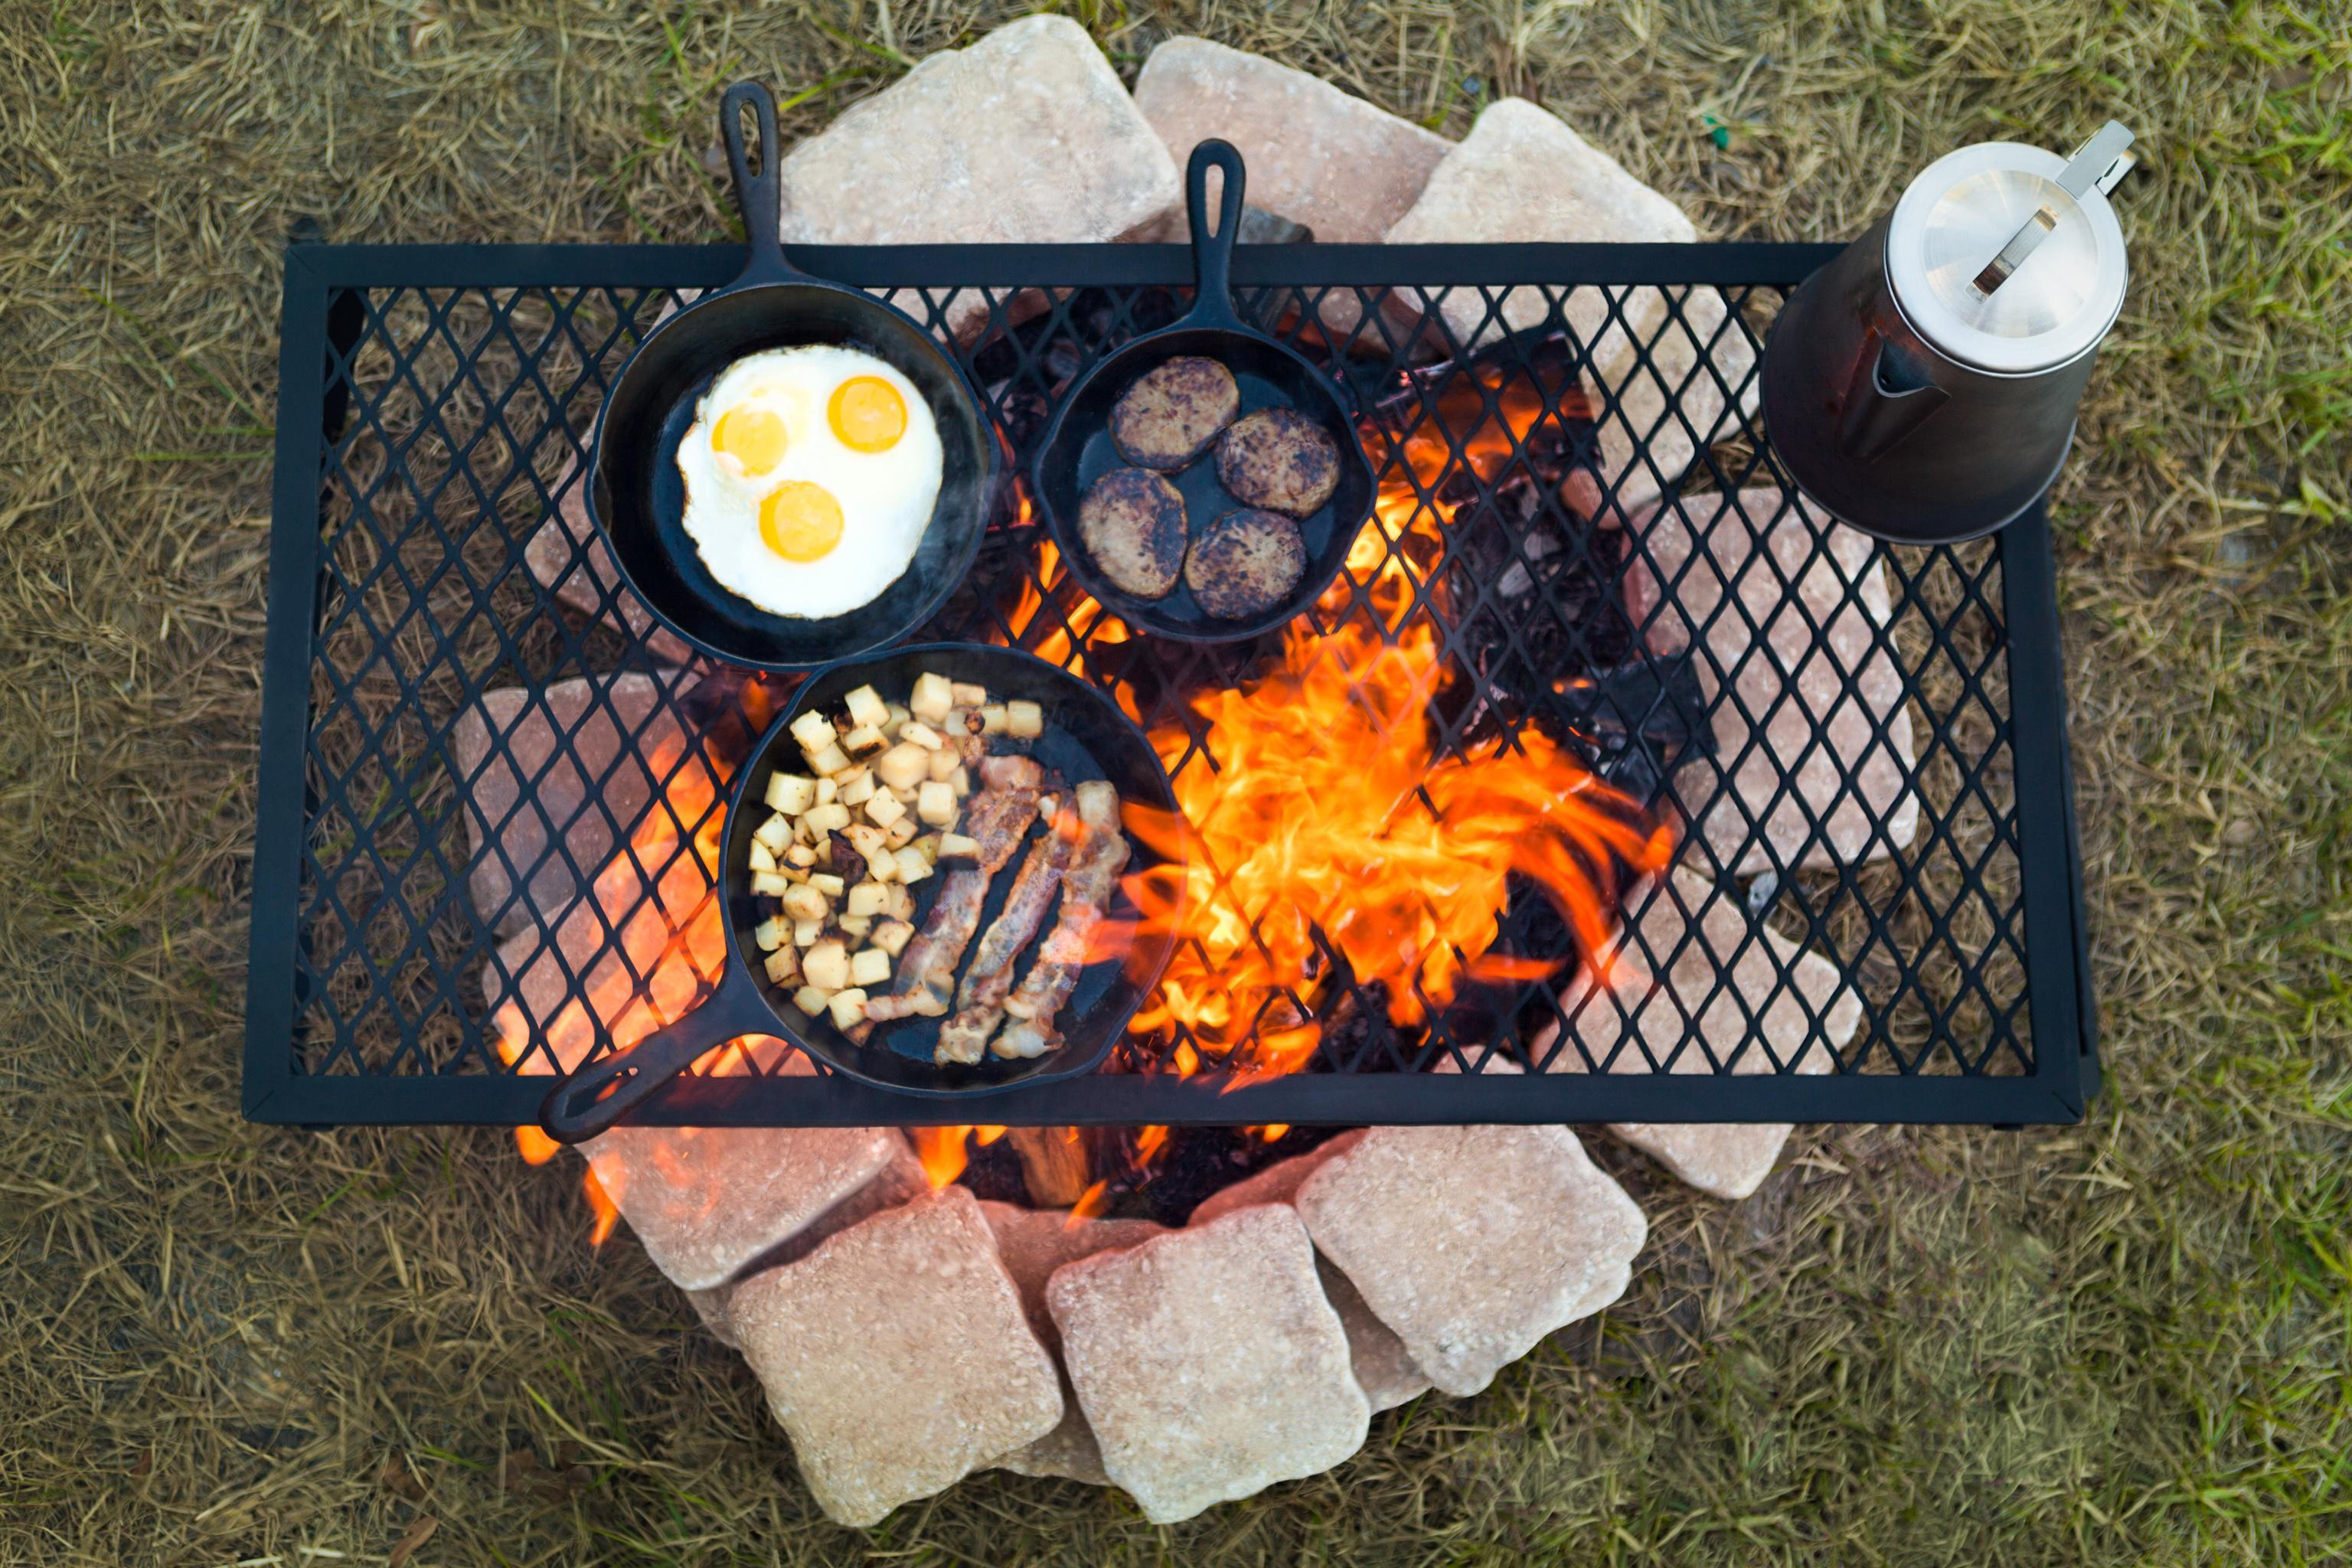 Campfire Grill Heavy Duty Folding Cooking Over Open Fire Welded Steel X-Large